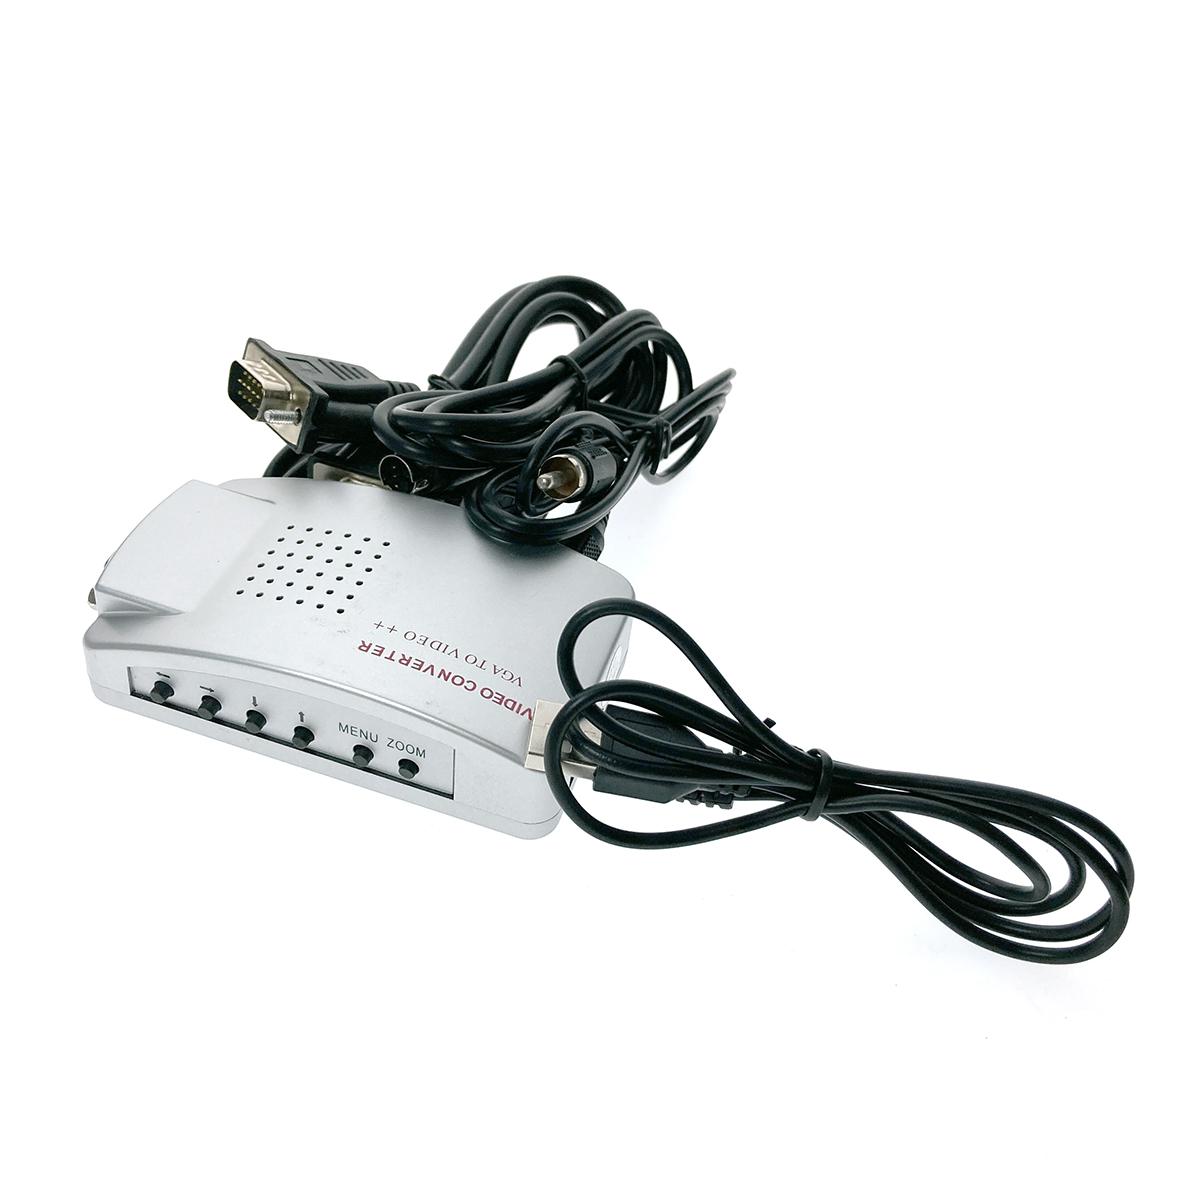 Конвертер VGA to S-video, Composite Video RCA, VGA Espada EDH11